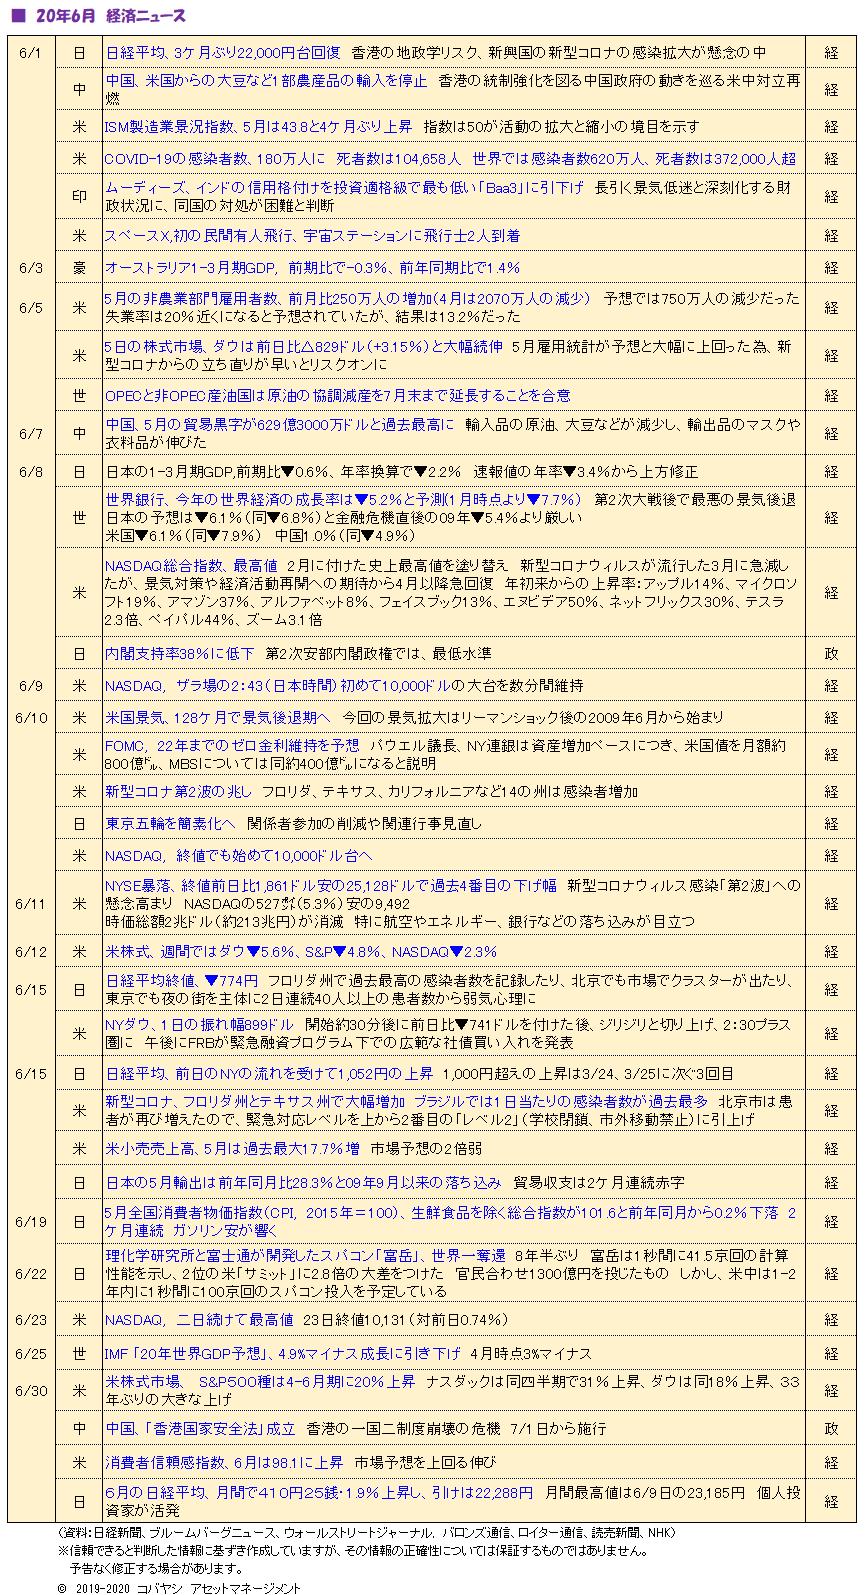 20200707_2006ニュース